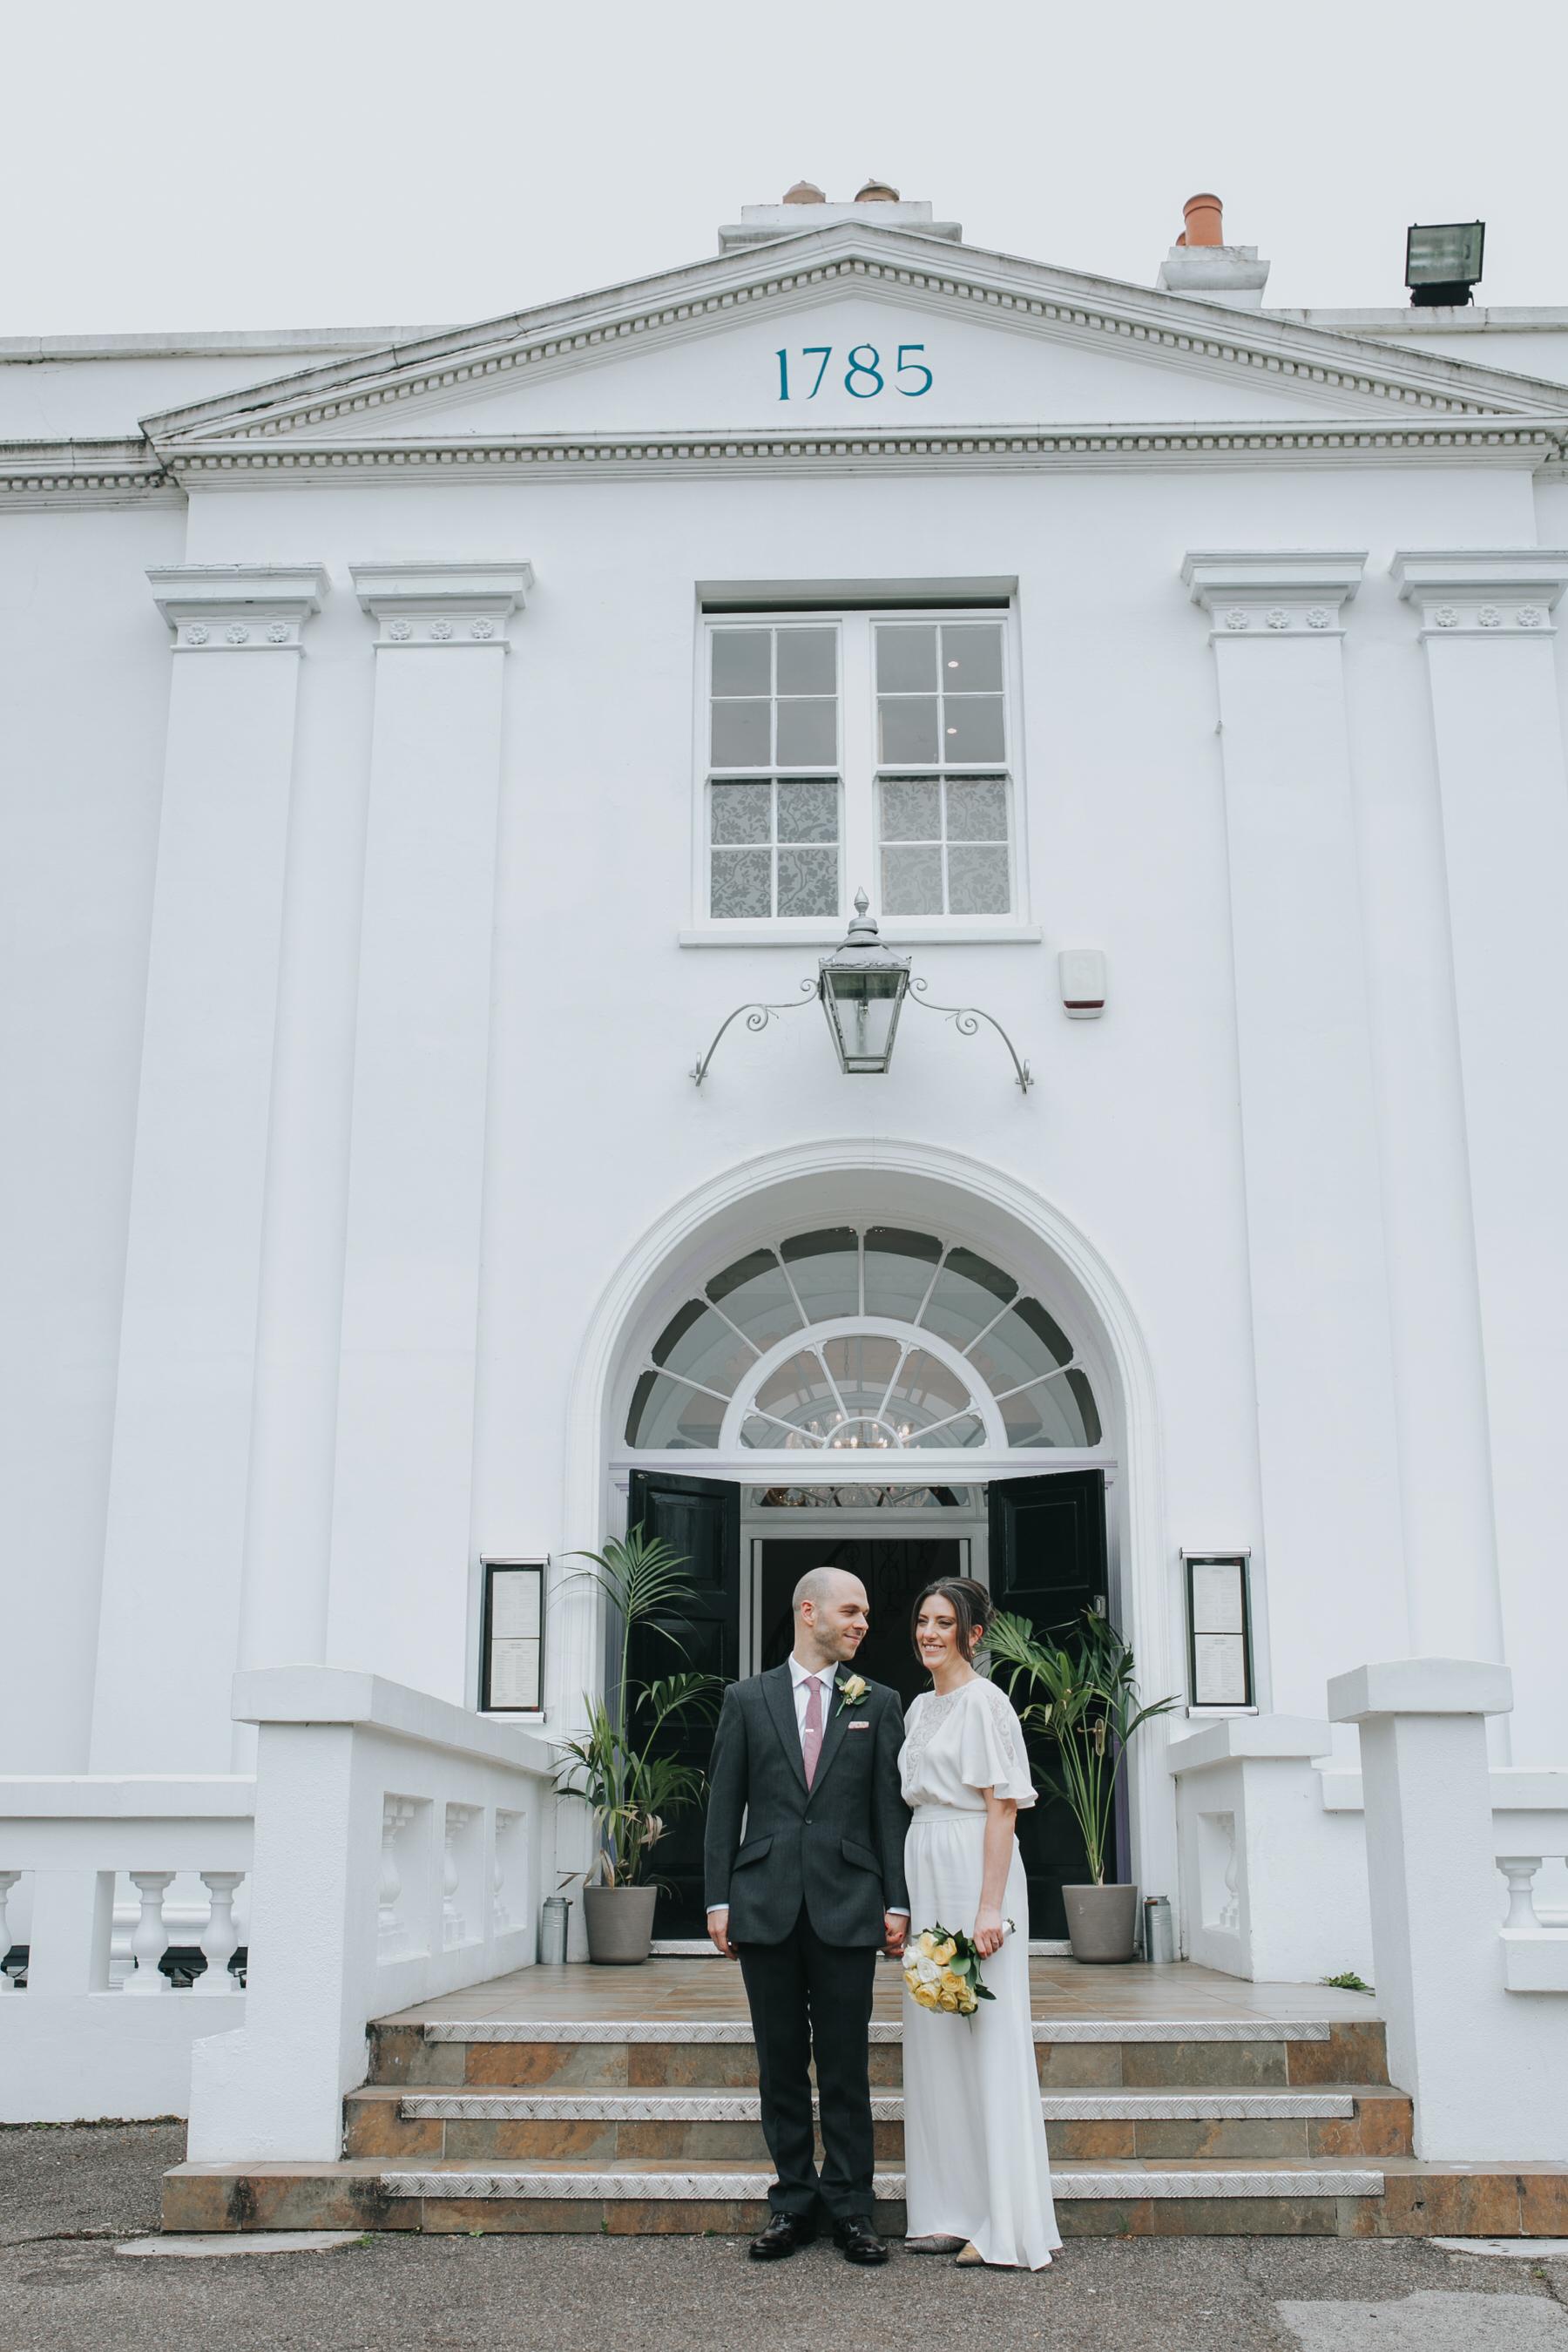 203 Belair House wedding portraits London reportage photographer.jpg